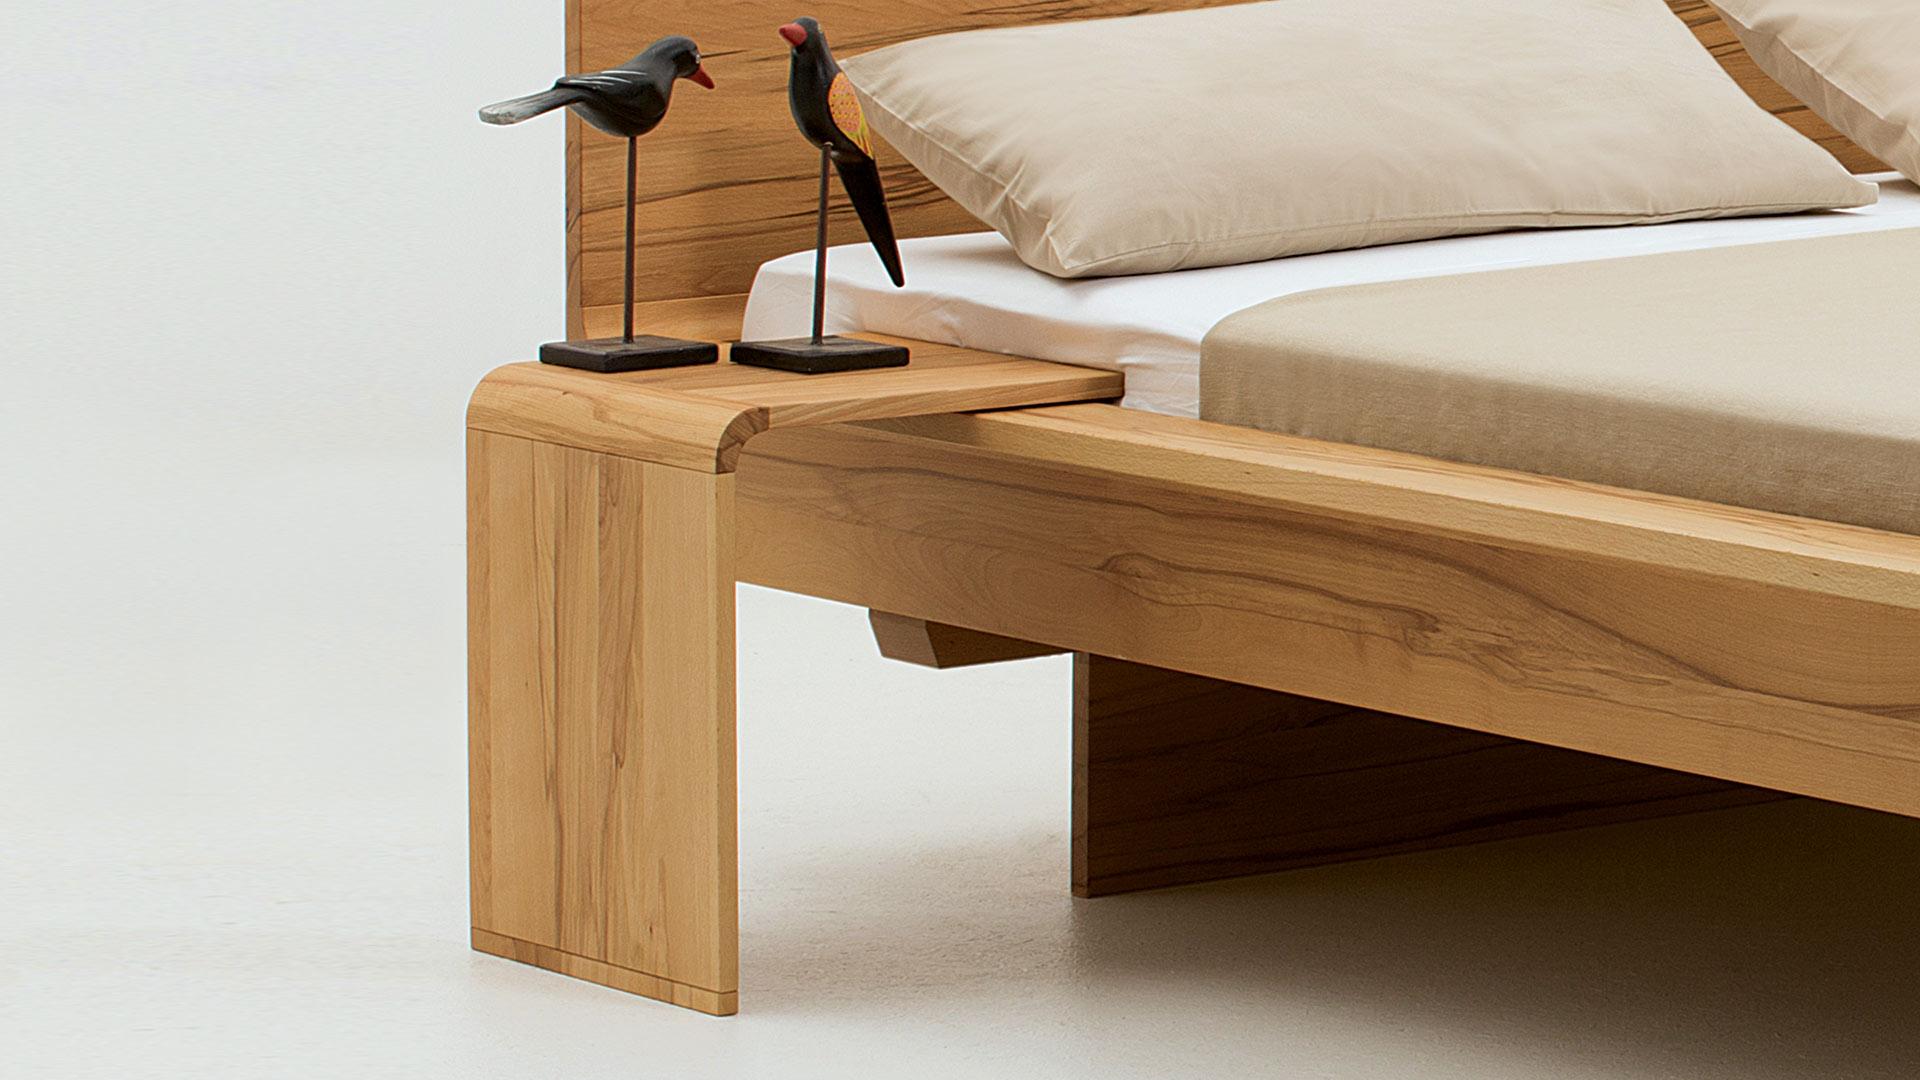 nachttisch calamona. Black Bedroom Furniture Sets. Home Design Ideas